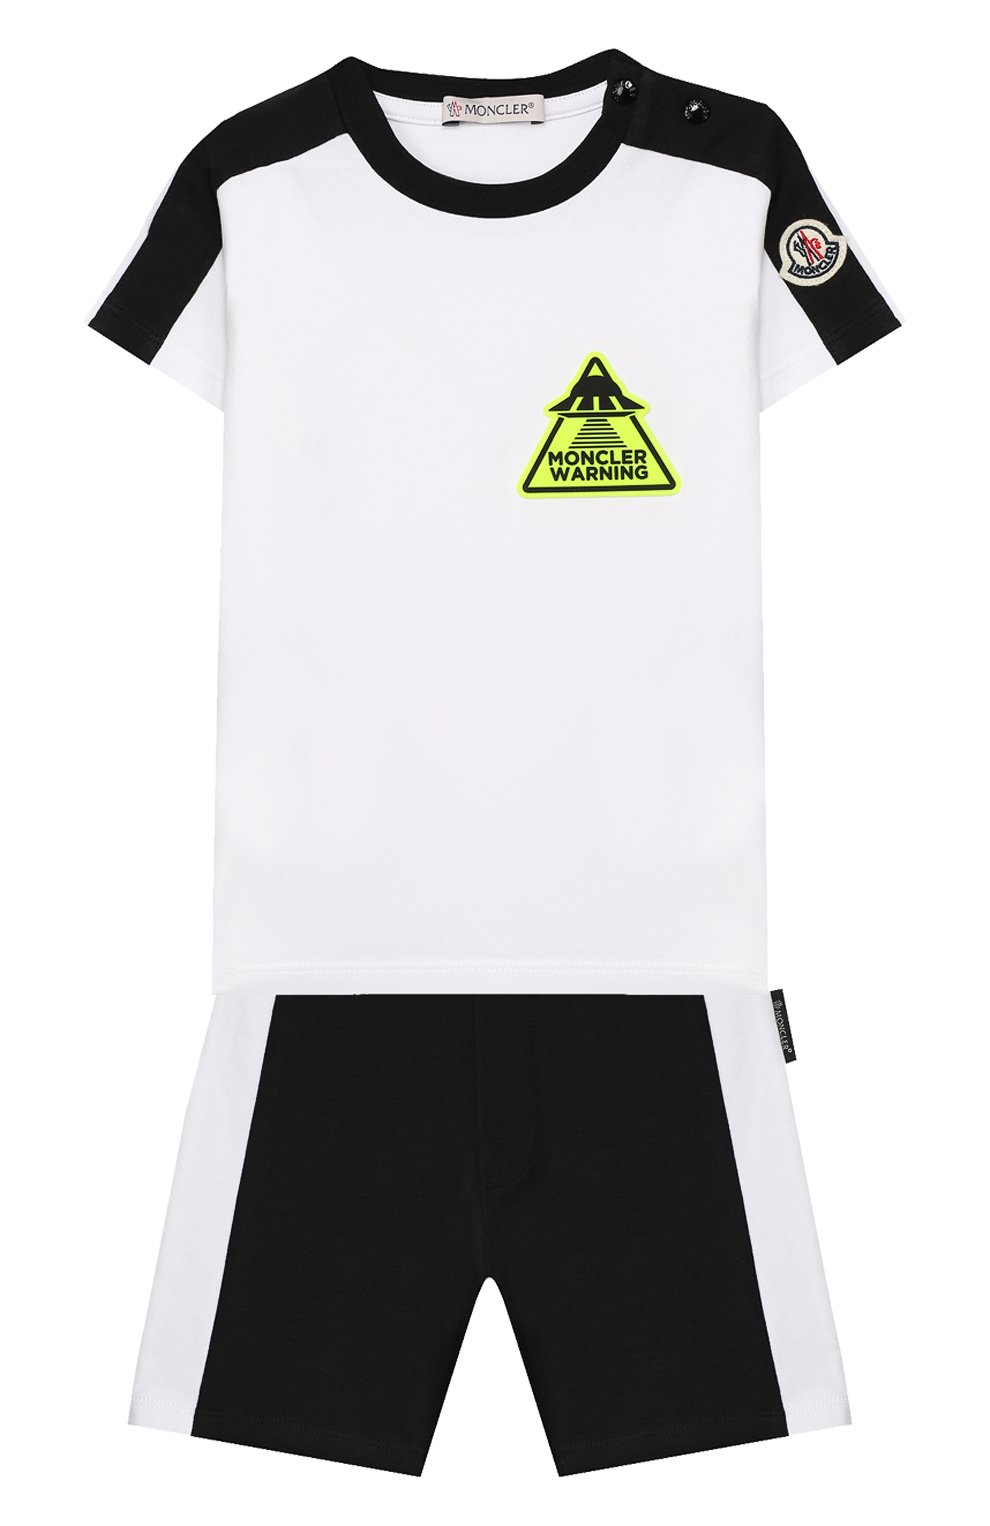 Комплект из футболки и шорт   Фото №1